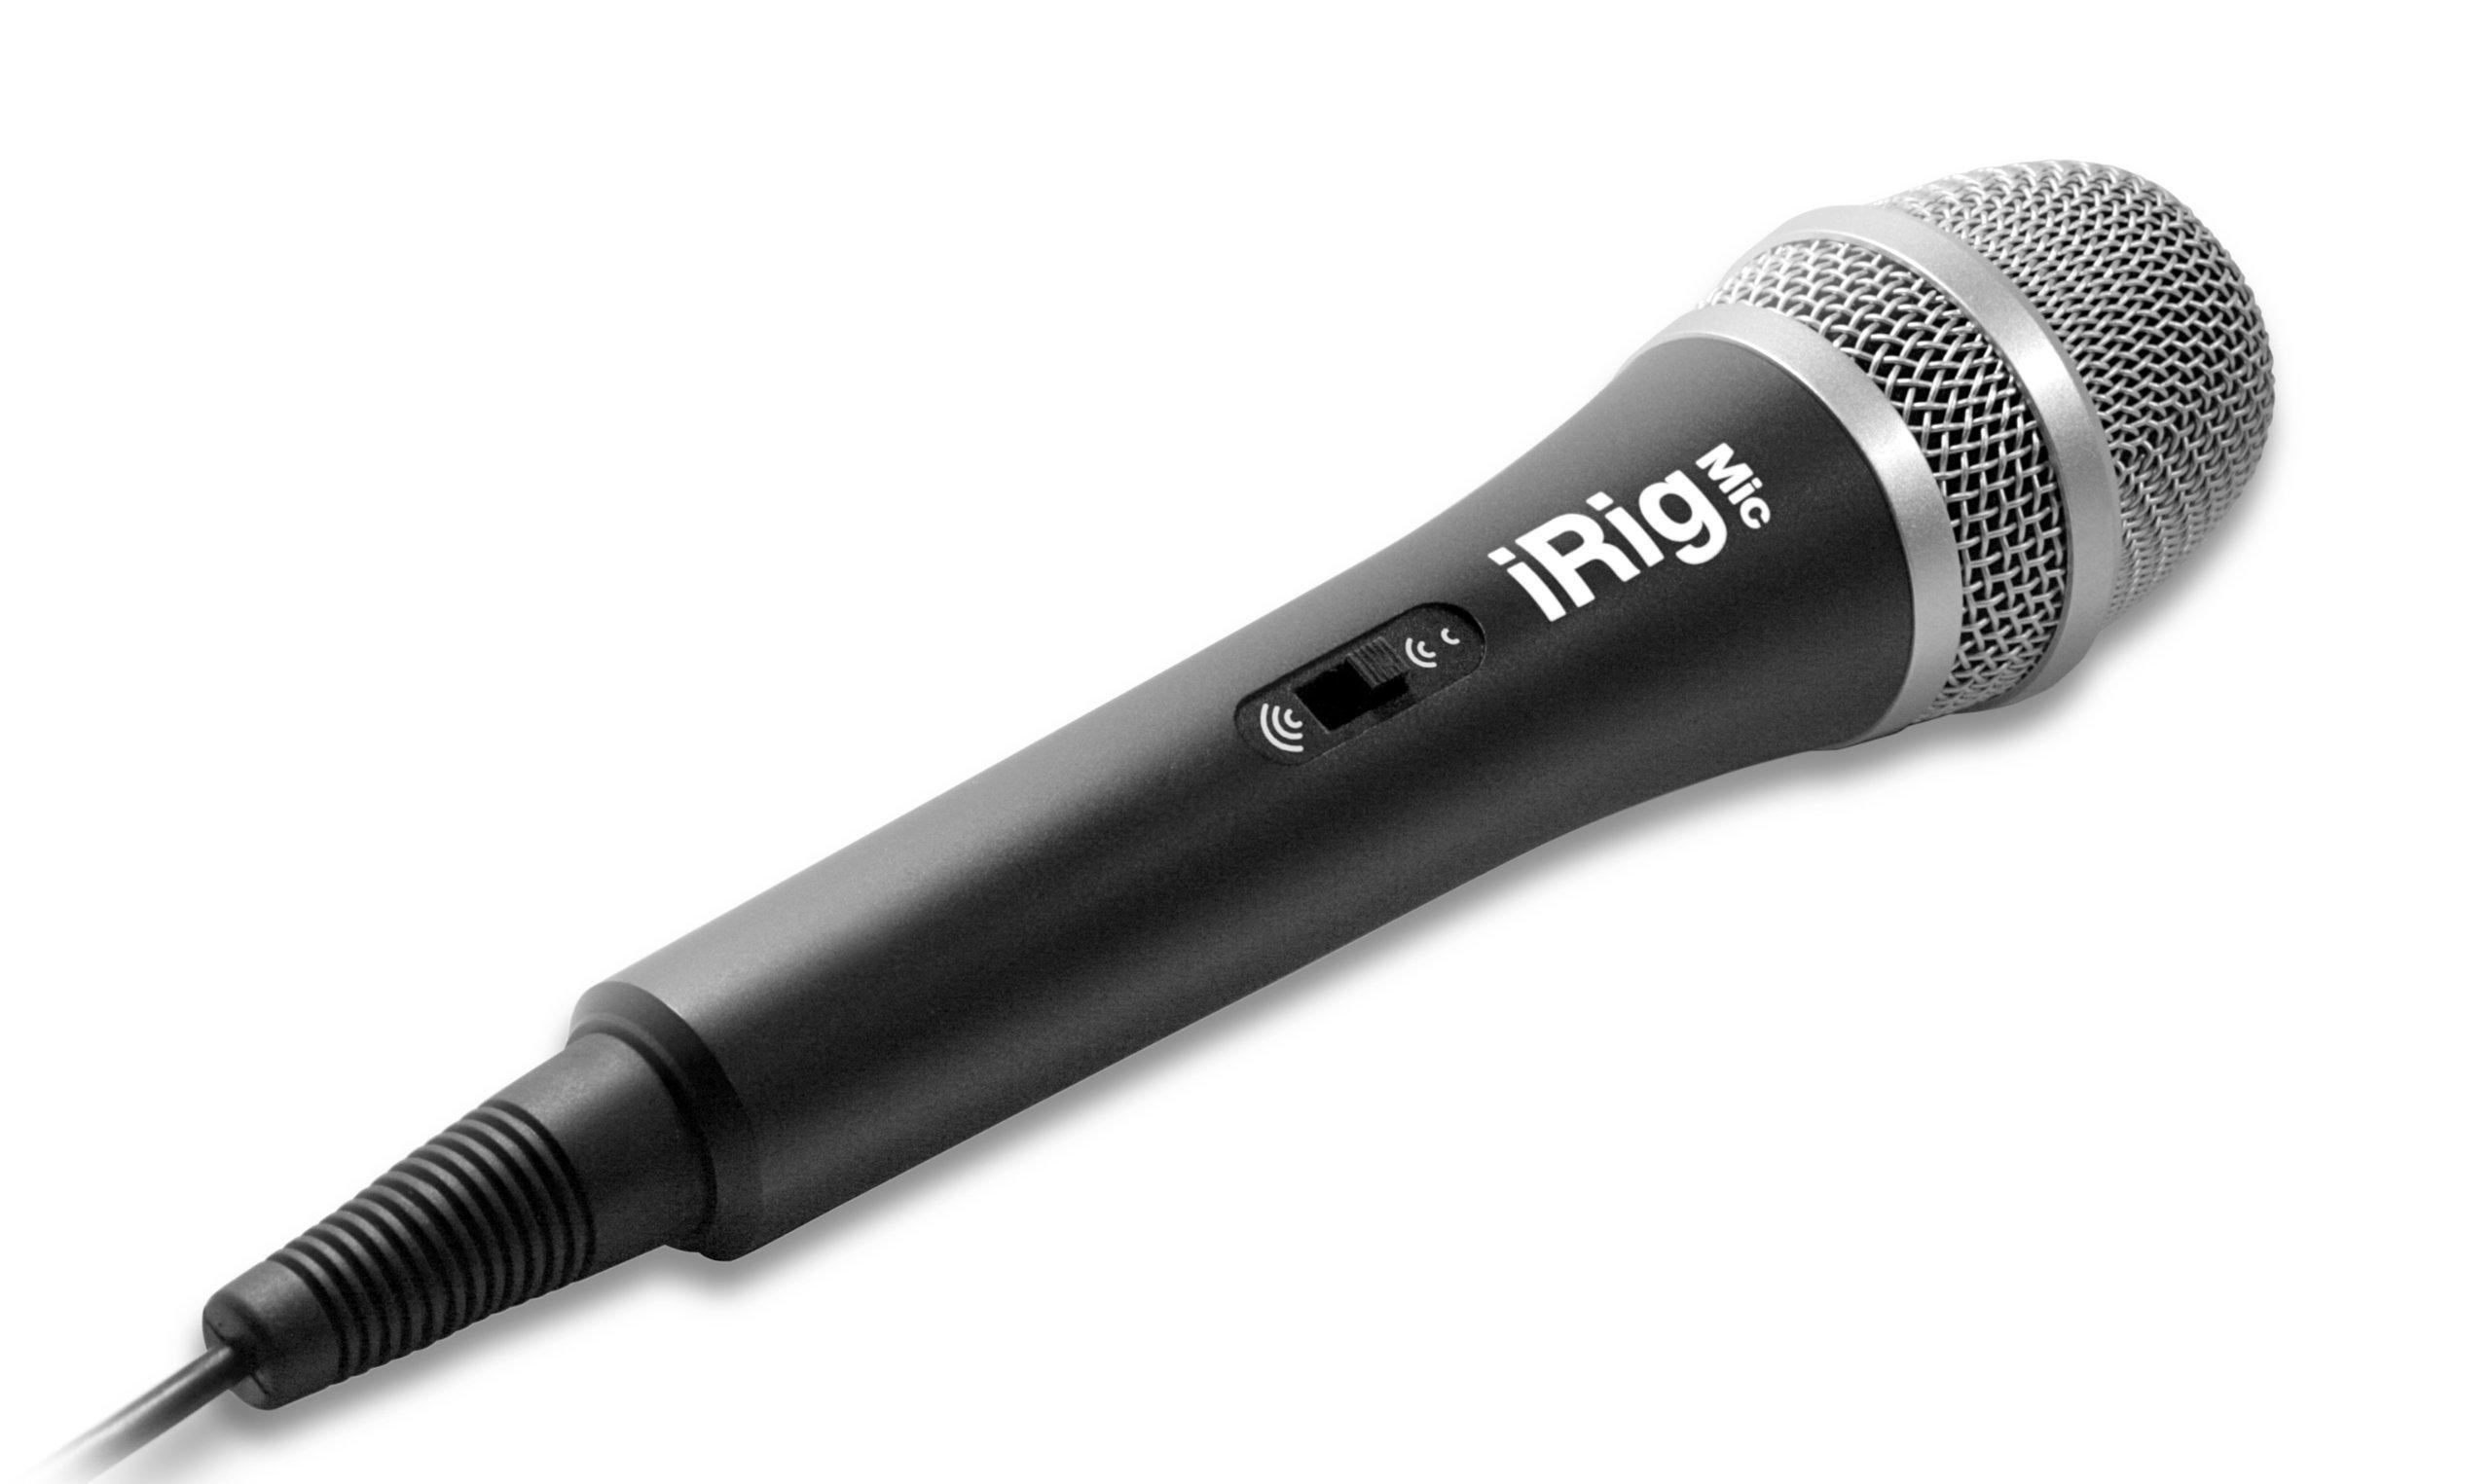 IK Multimedia iRig Mic handeld condenser mic for smartphones and tablets by IK Multimedia